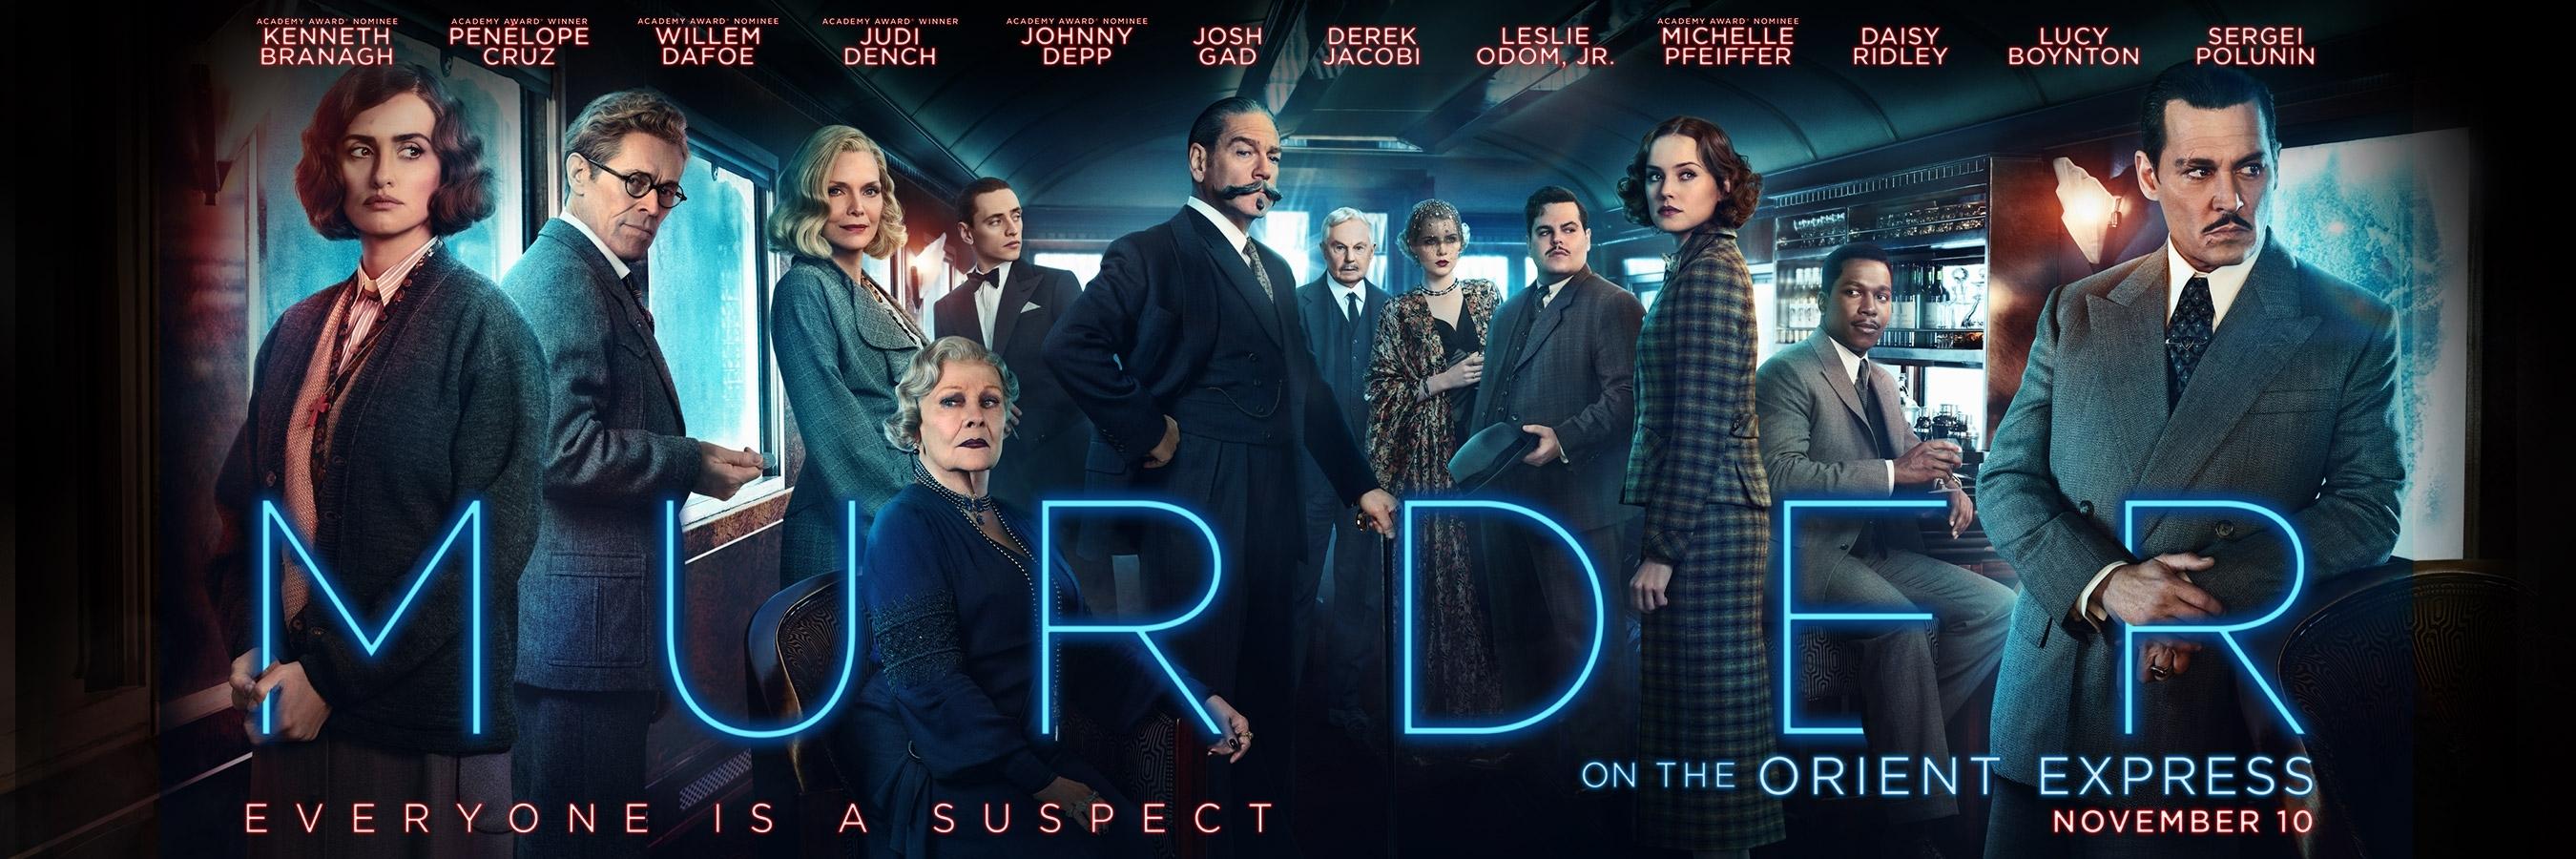 Movie Review Murder On The Orient Express 2017 Khiko Rayesmara